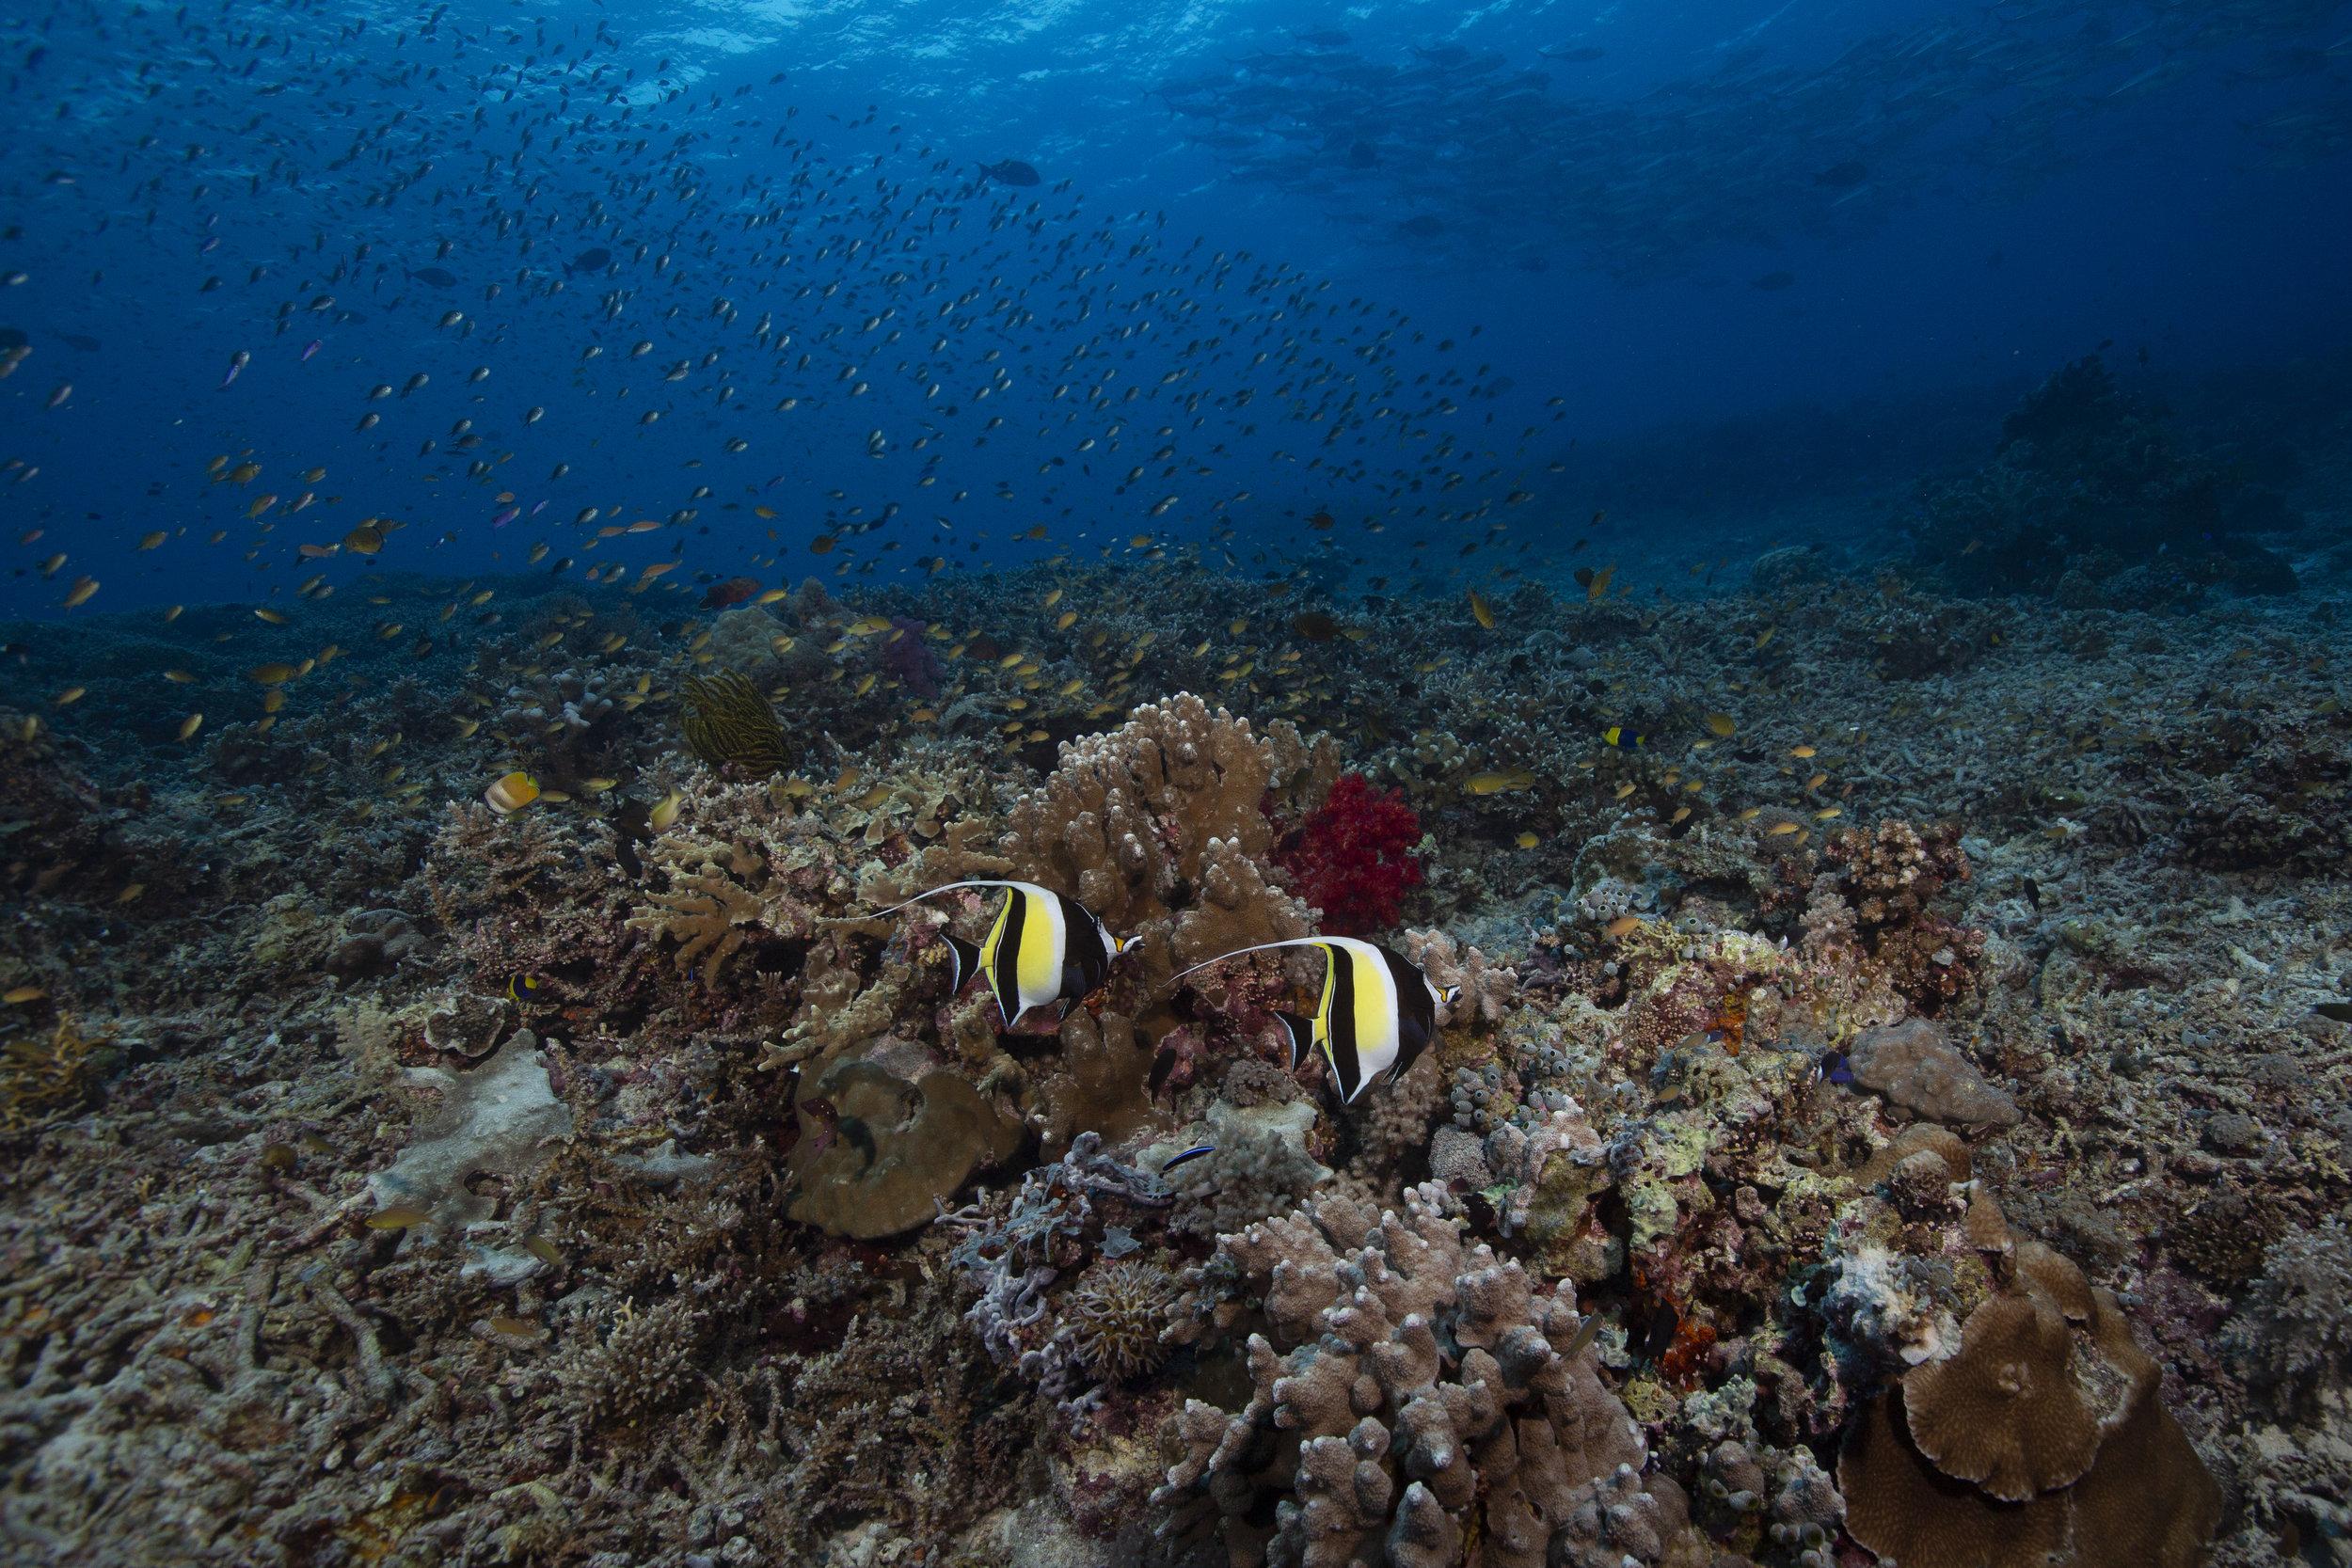 TUBBATAHA, PHILIPPINES CREDIT: RICK MISKIV / coral reef image bank